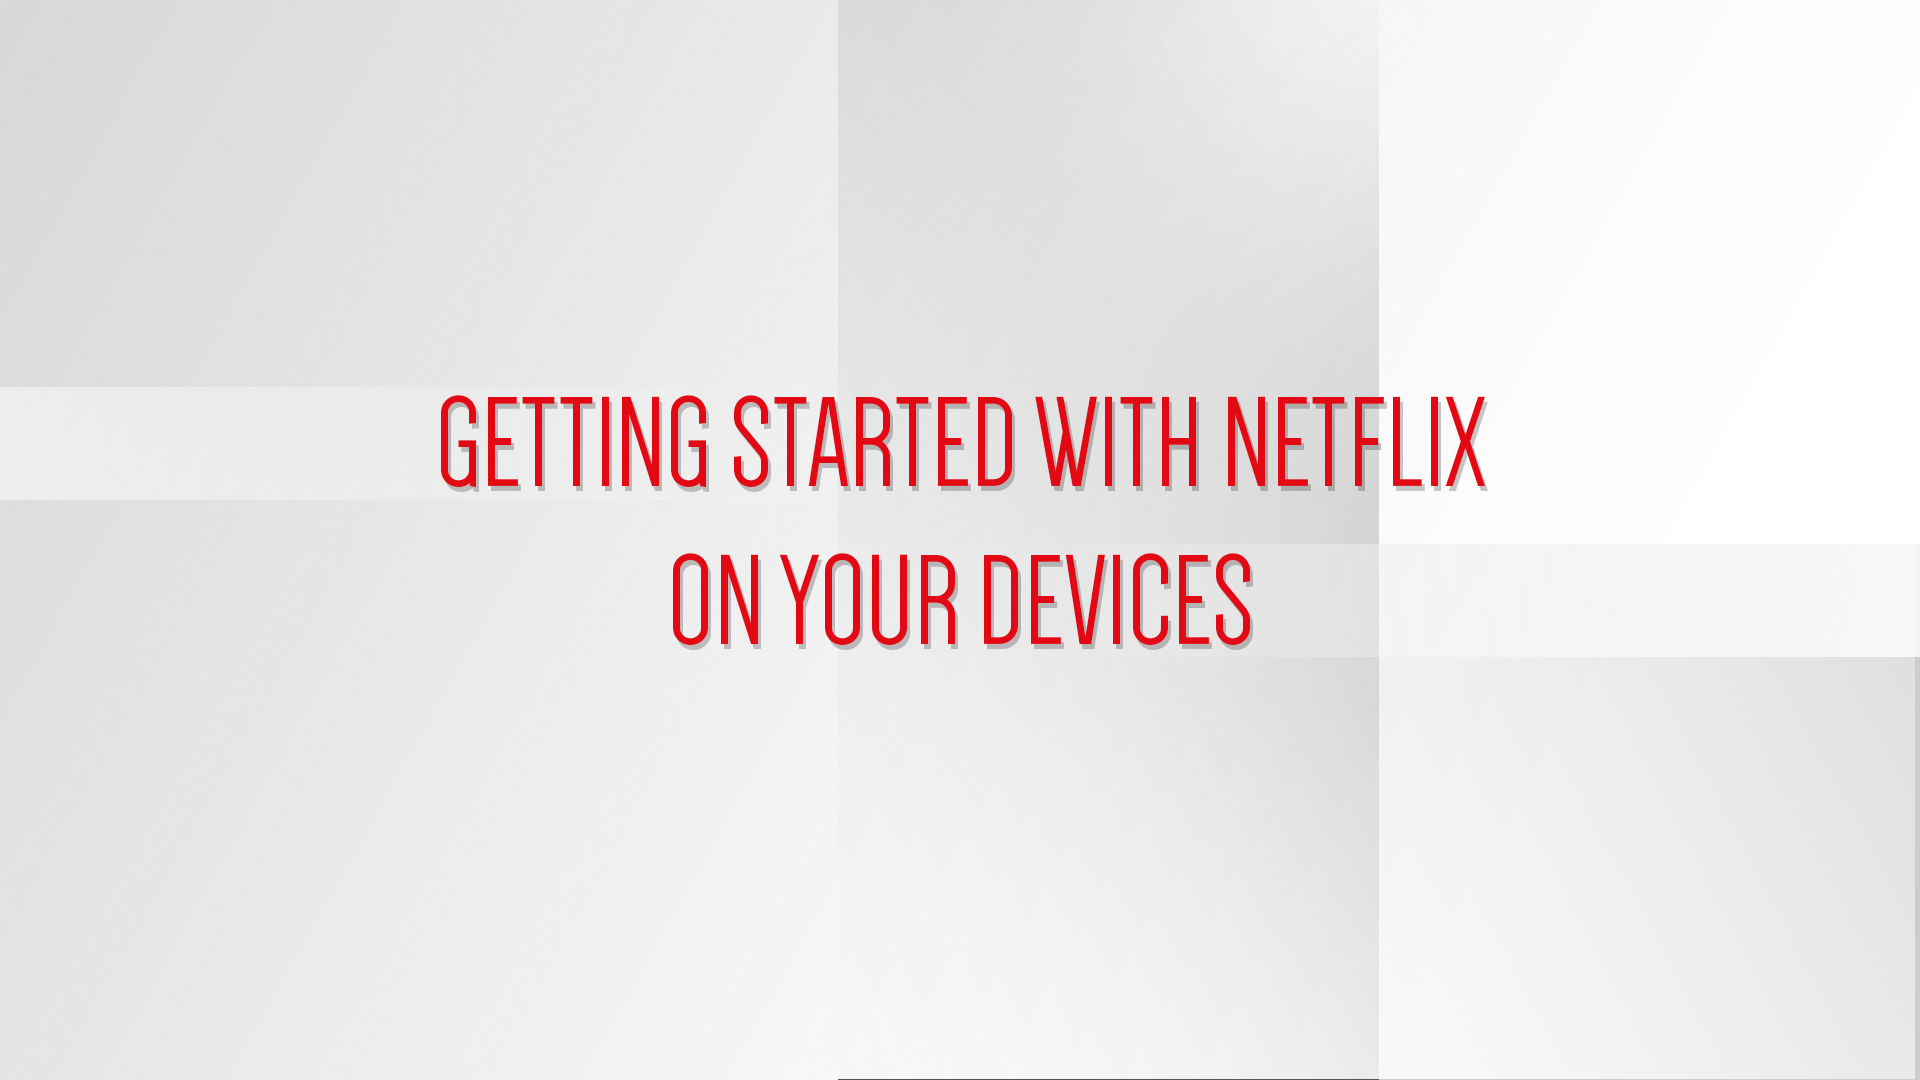 Netflix_HowTo_02.jpg